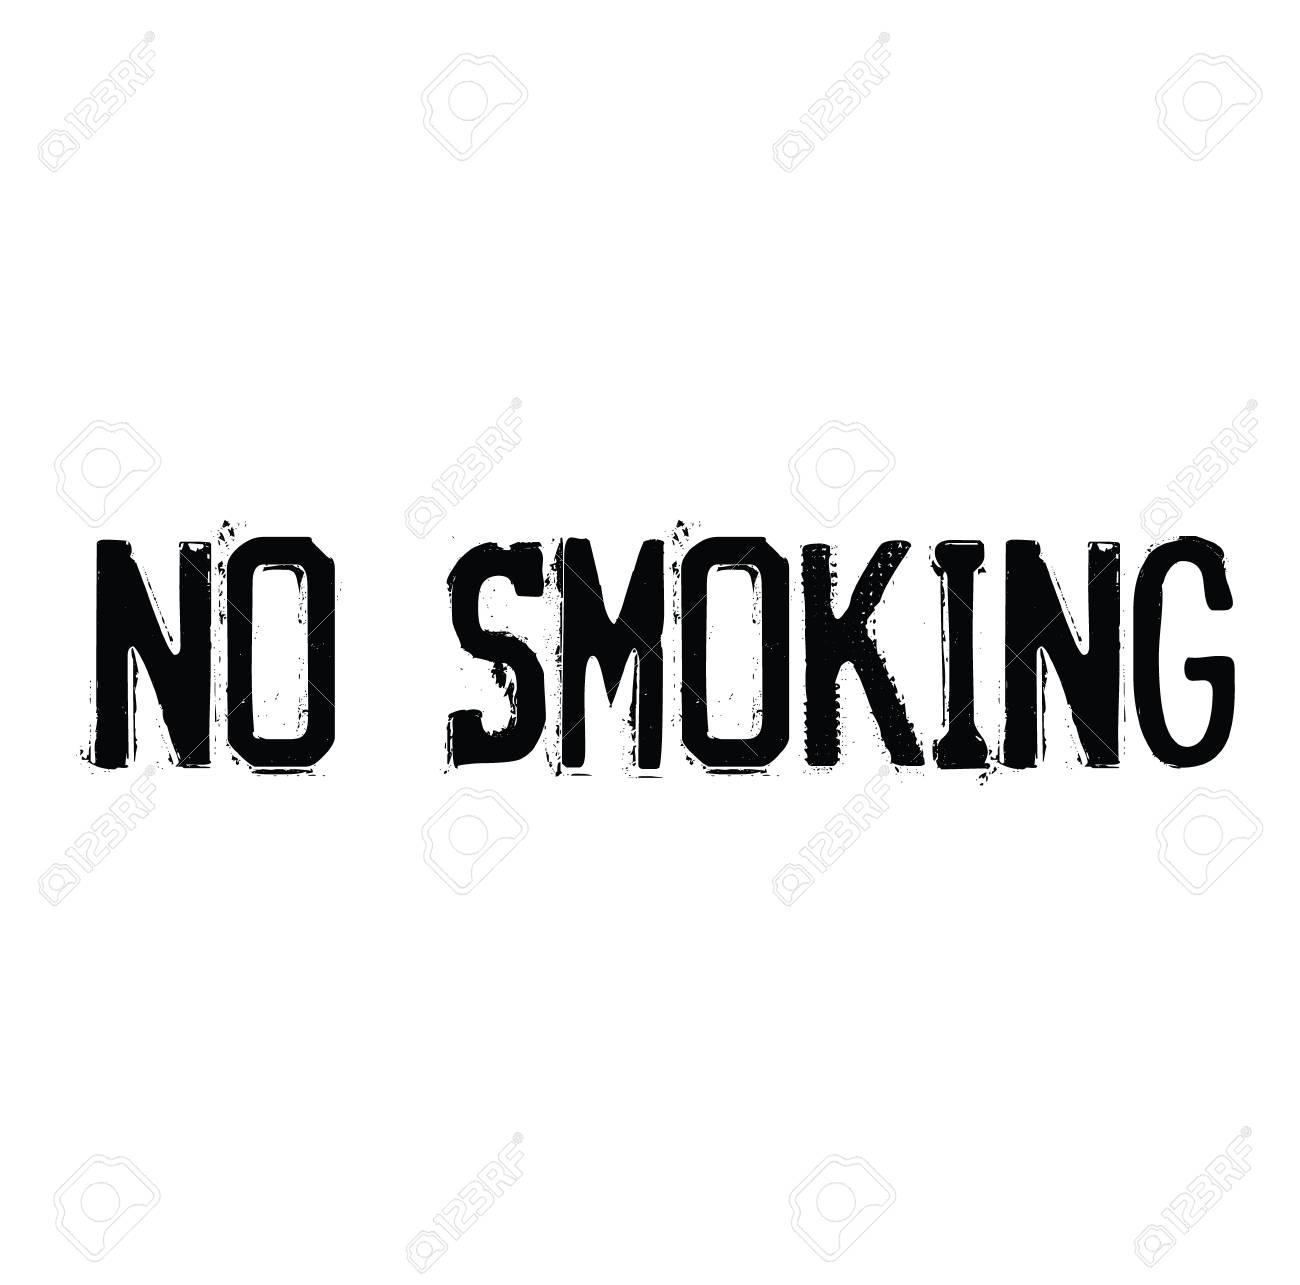 no smoking black and white